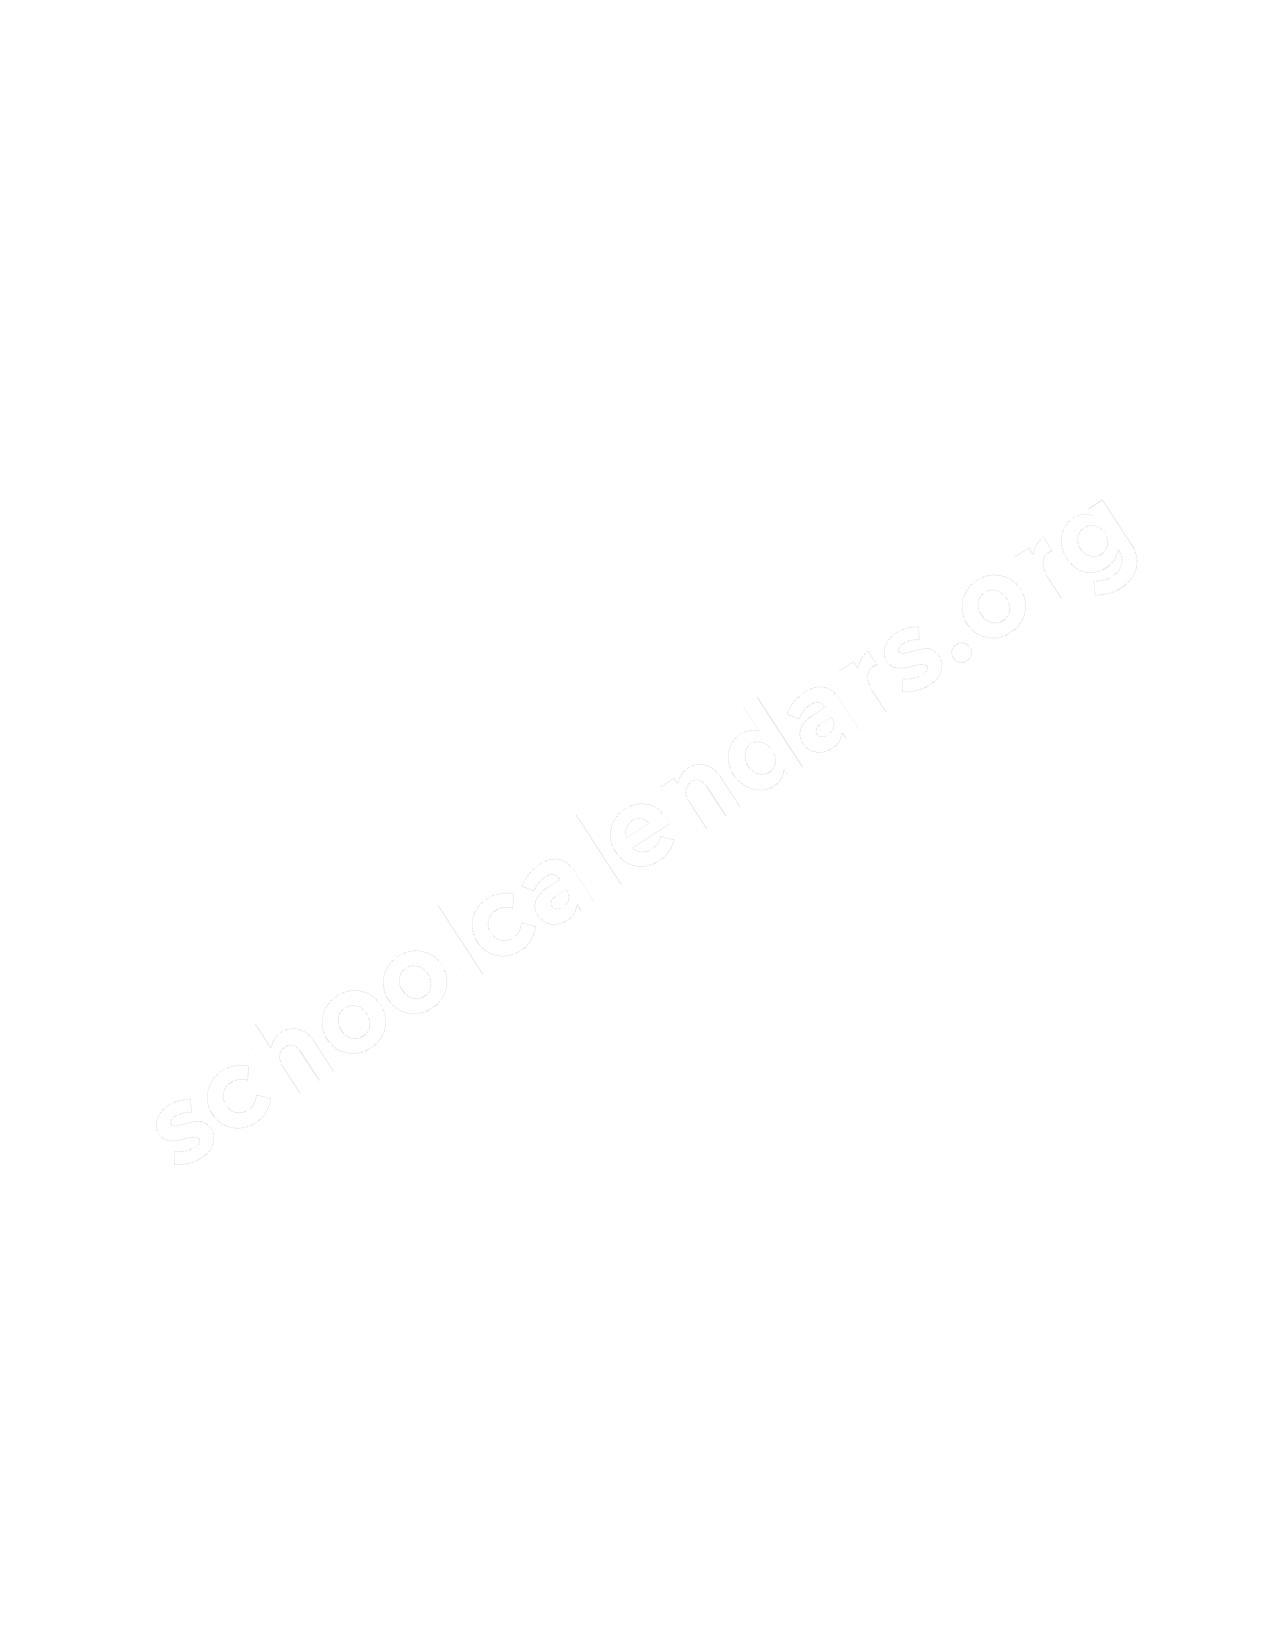 2017 - 2018 ECHS Calendar – Nash-Rocky Mount Public Schools – page 2